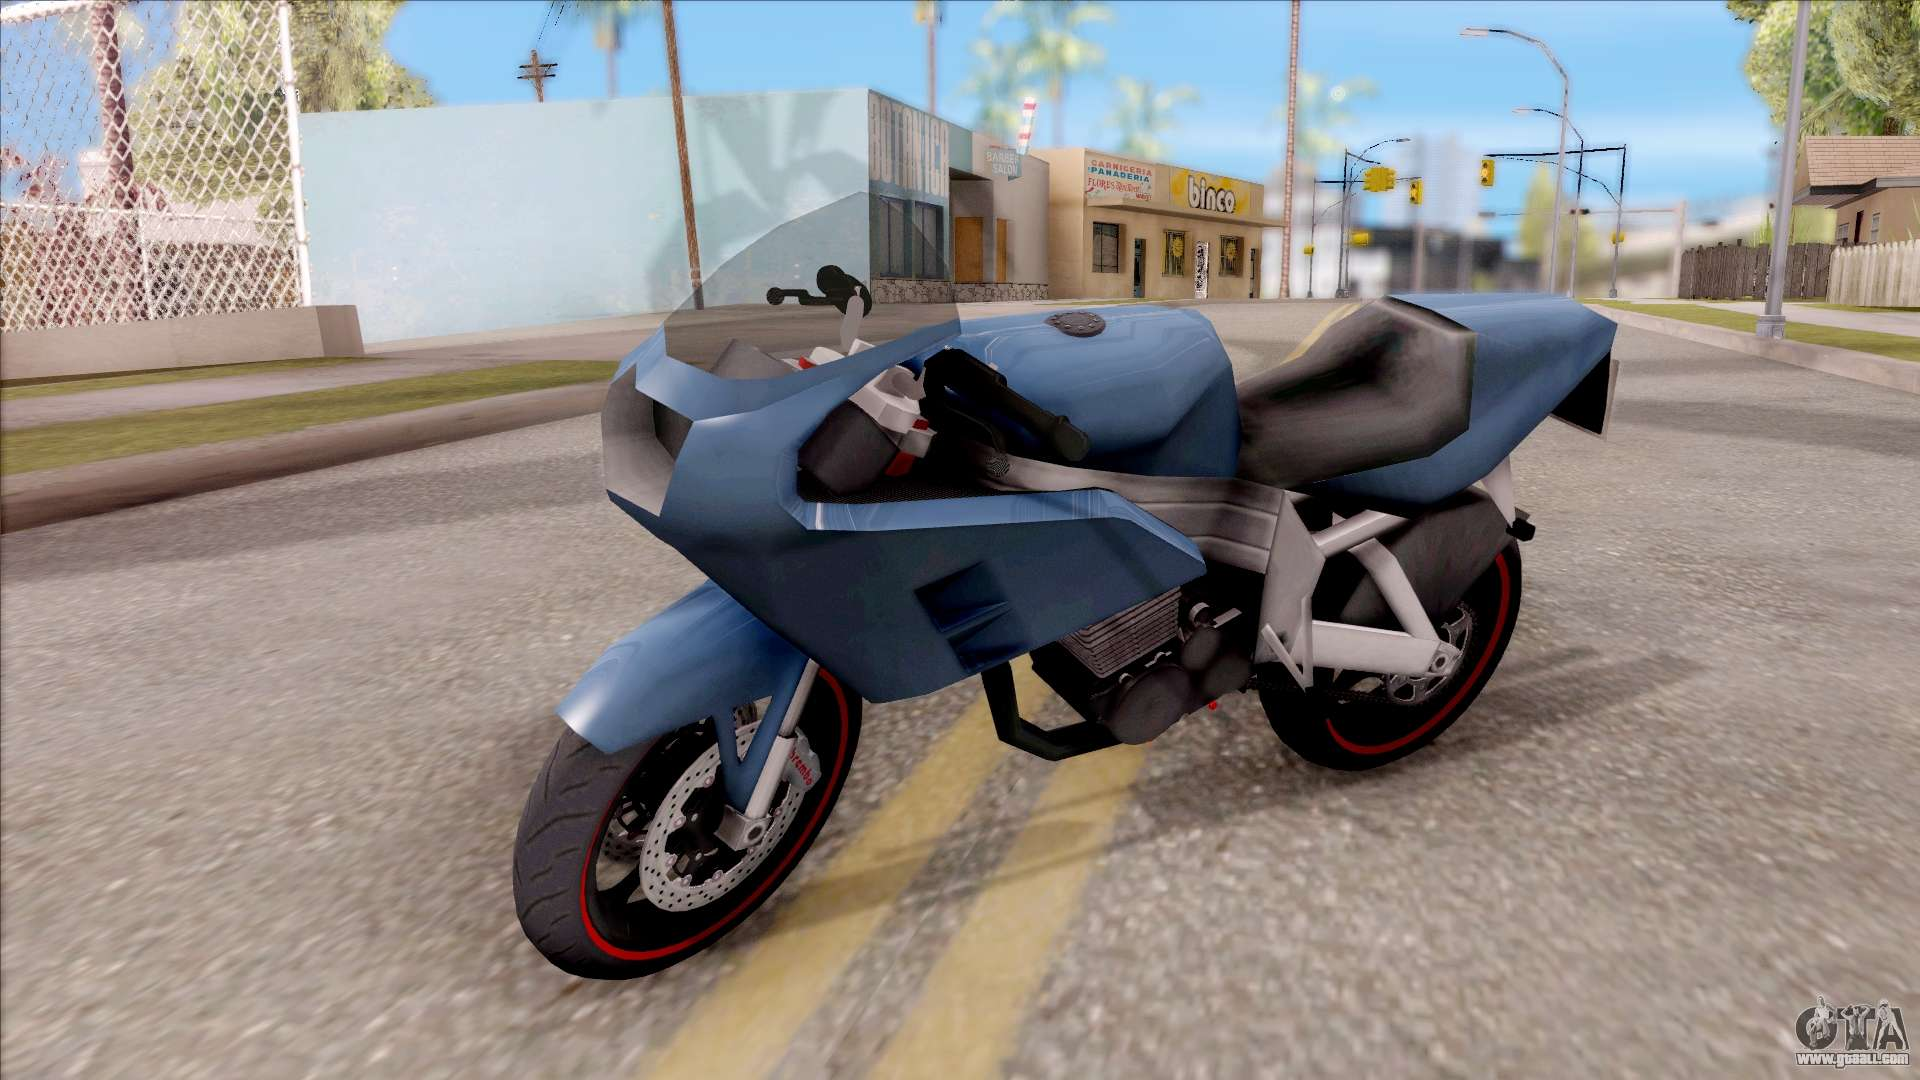 Gta Sa Fcr-900 motorcycle mods - GTA San Andreas